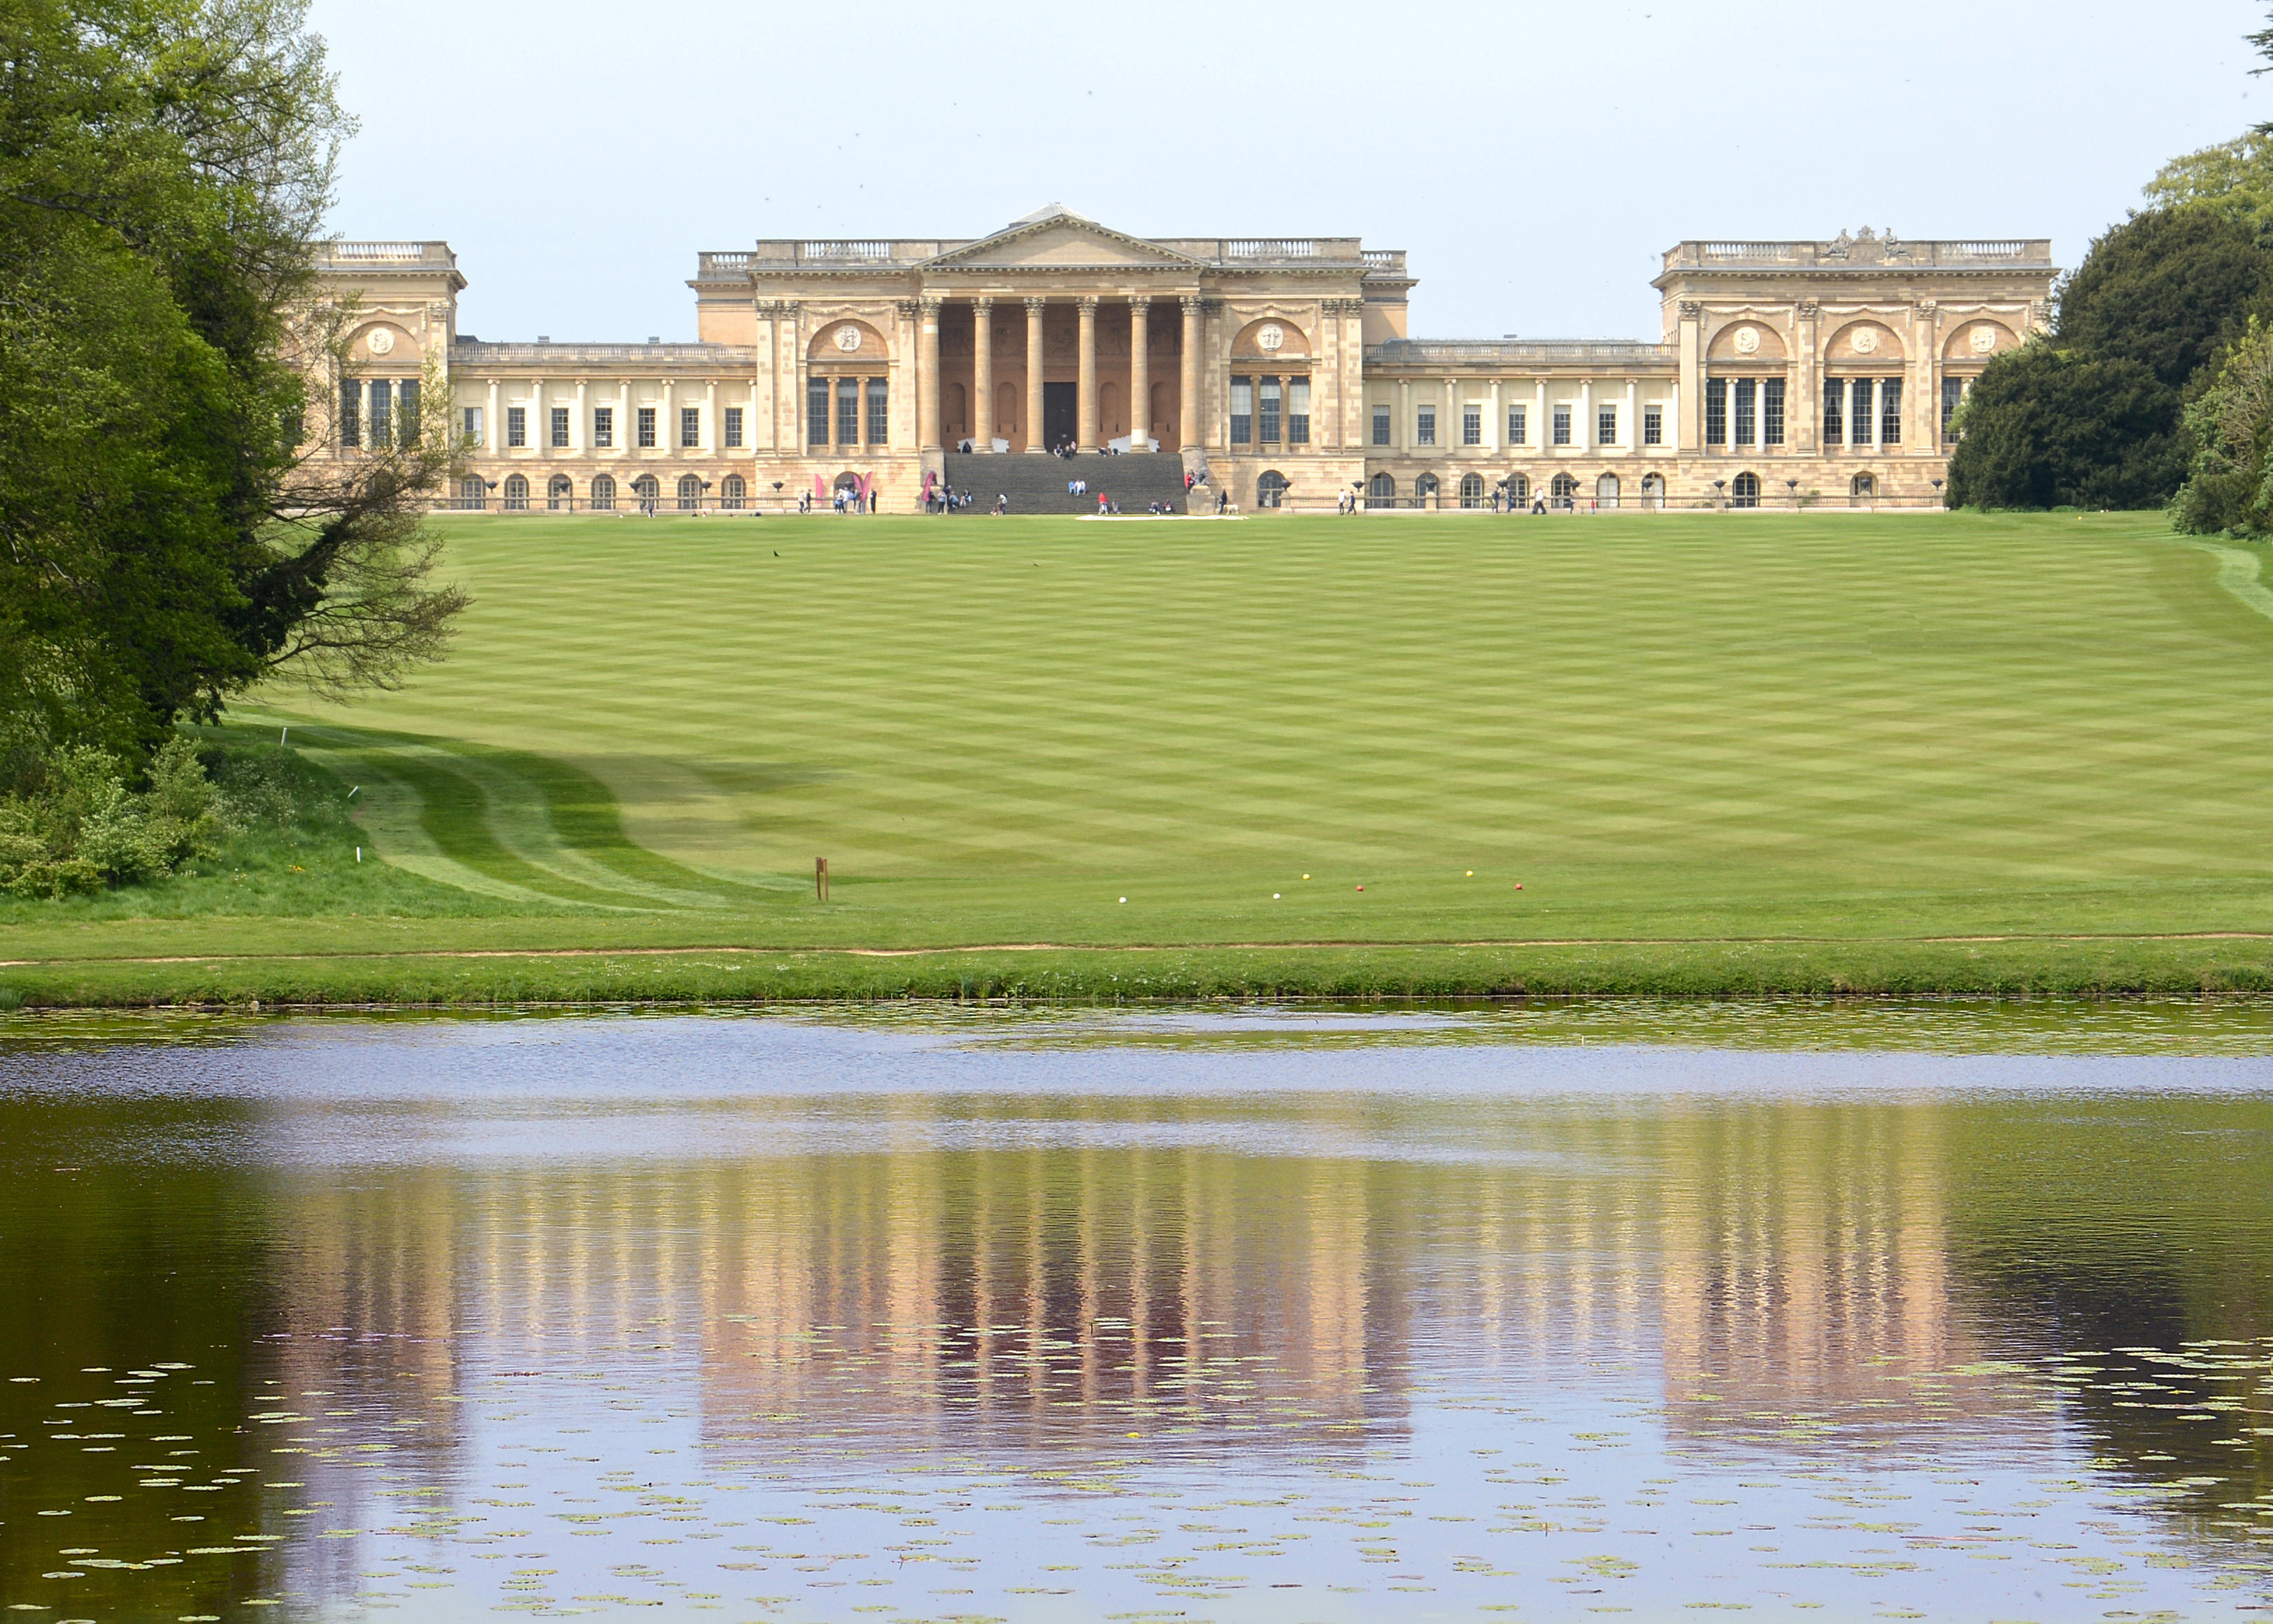 Stowe, Buckinghamshire. Staycation Inspiration by Malvern Garden Buildings